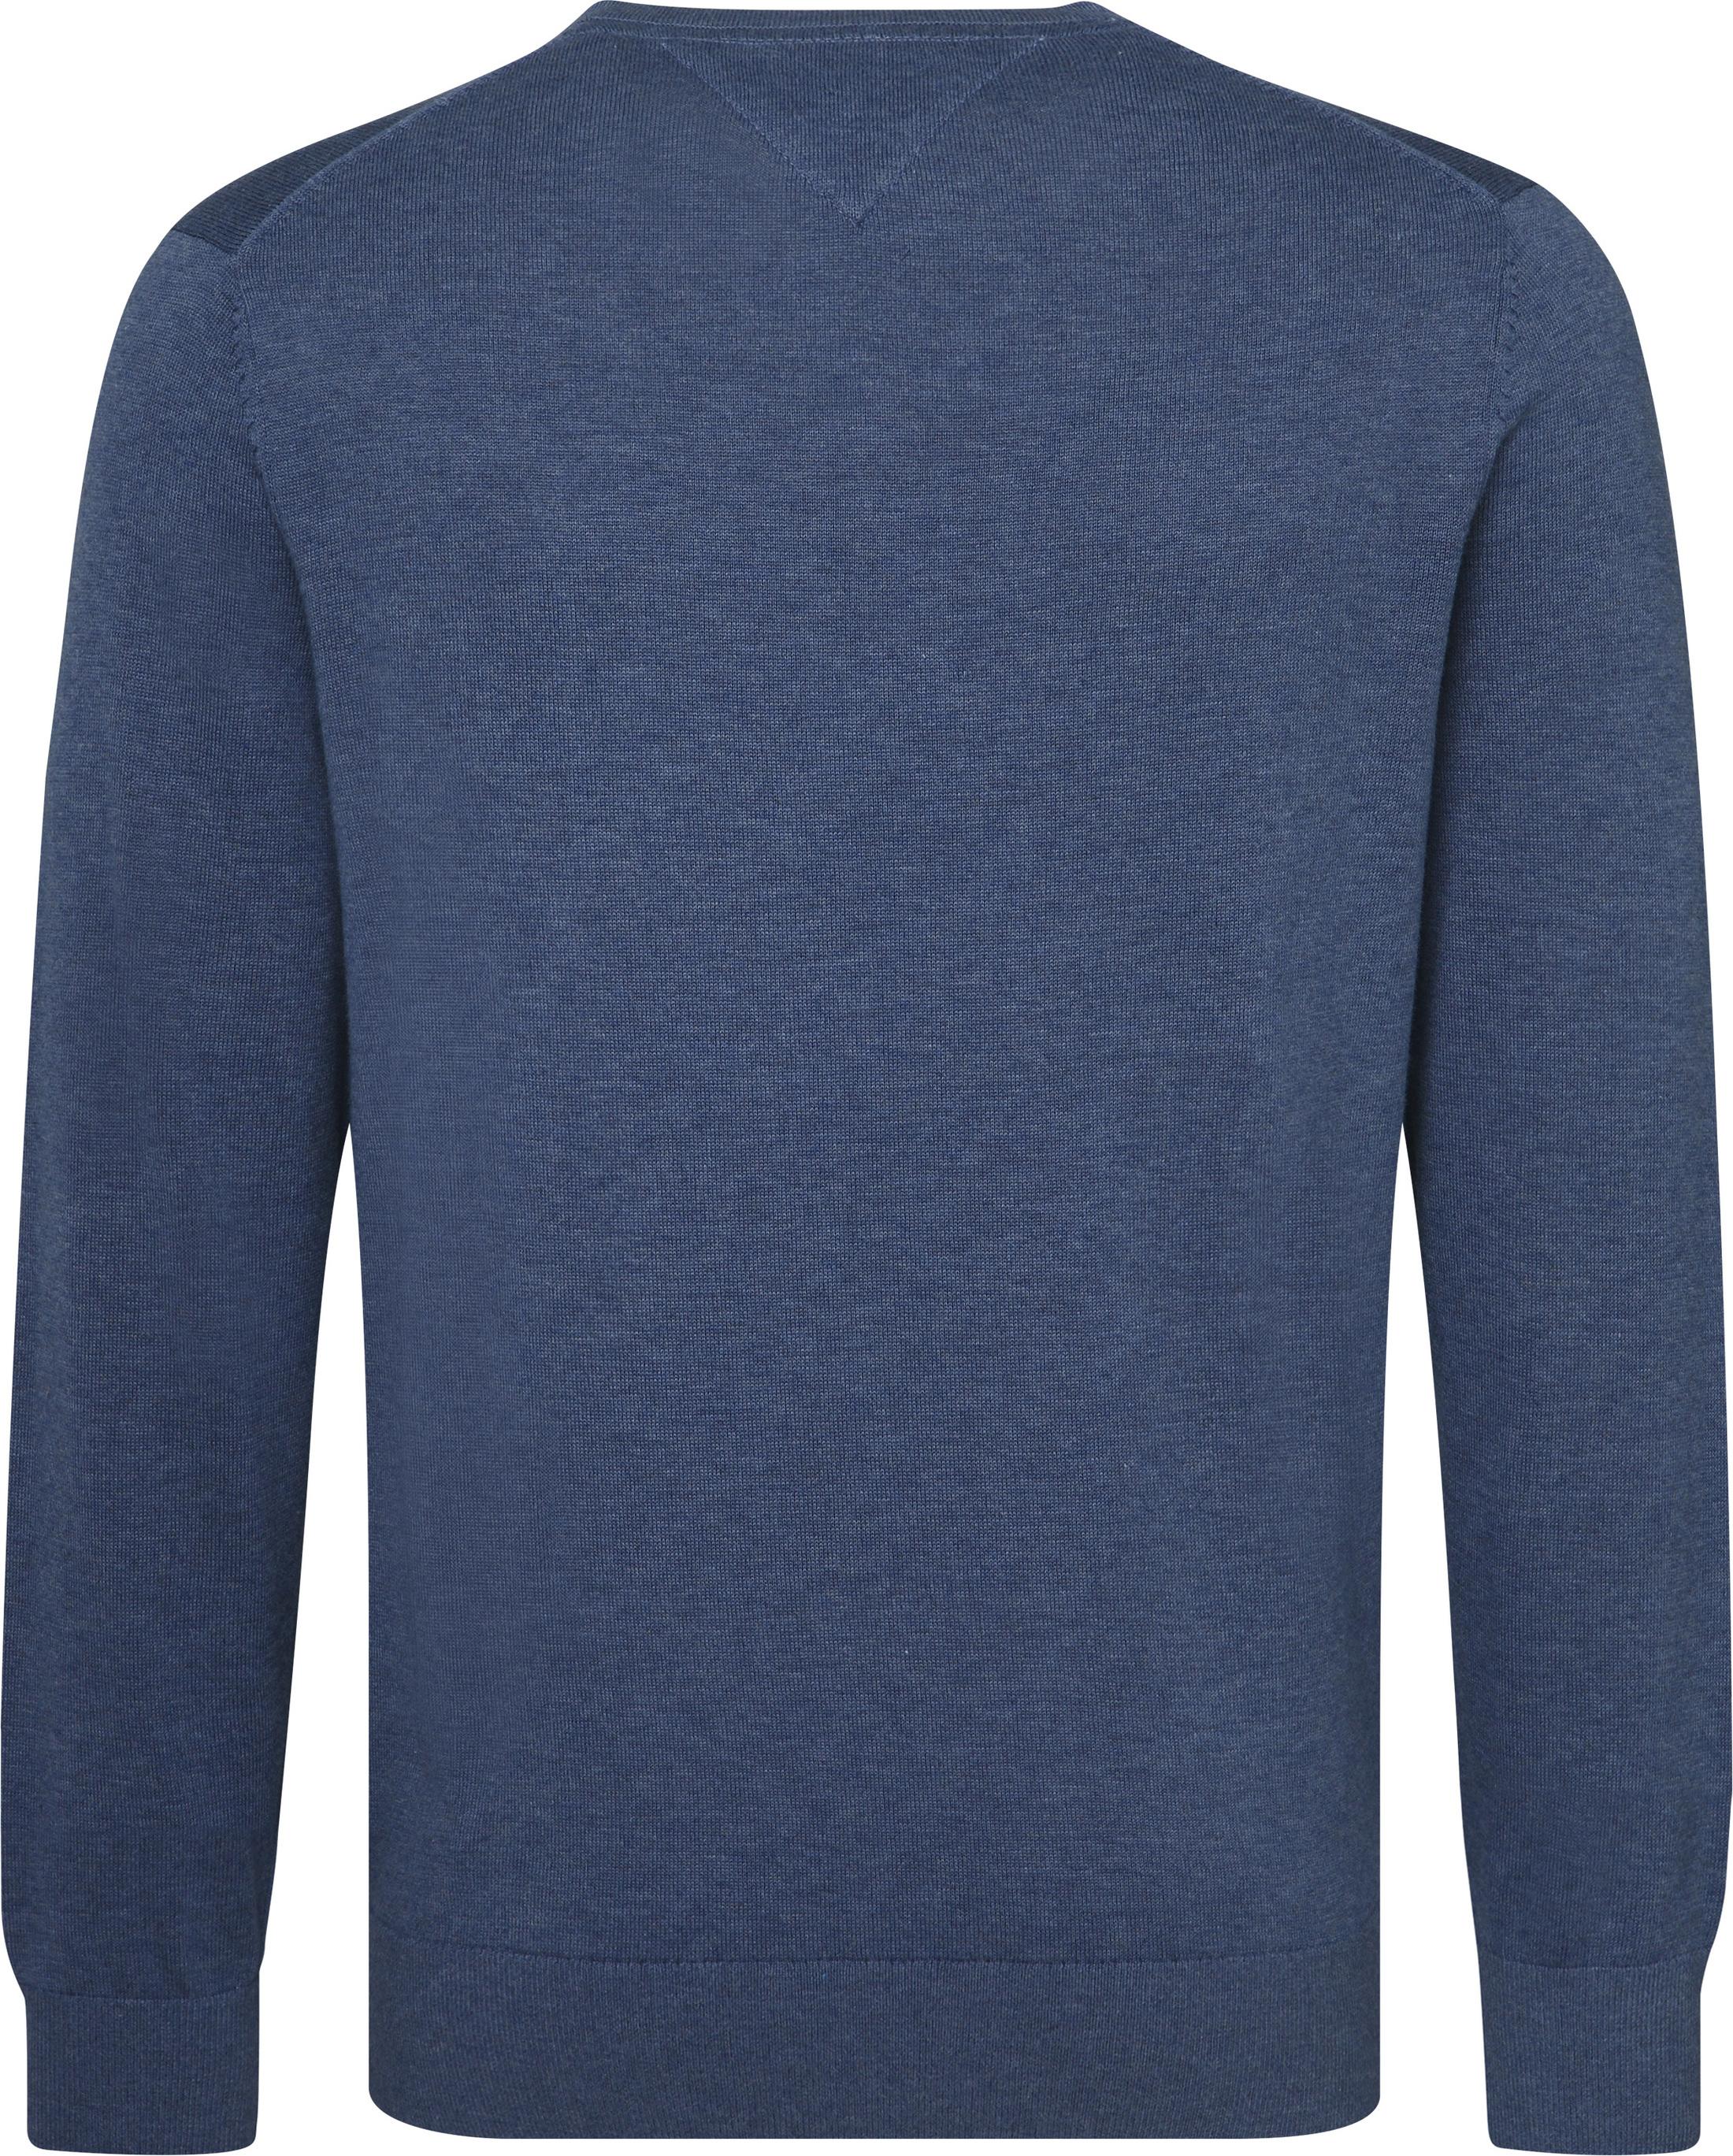 Tommy Hilfiger Pullover V-Hals Indigo Blauw foto 1